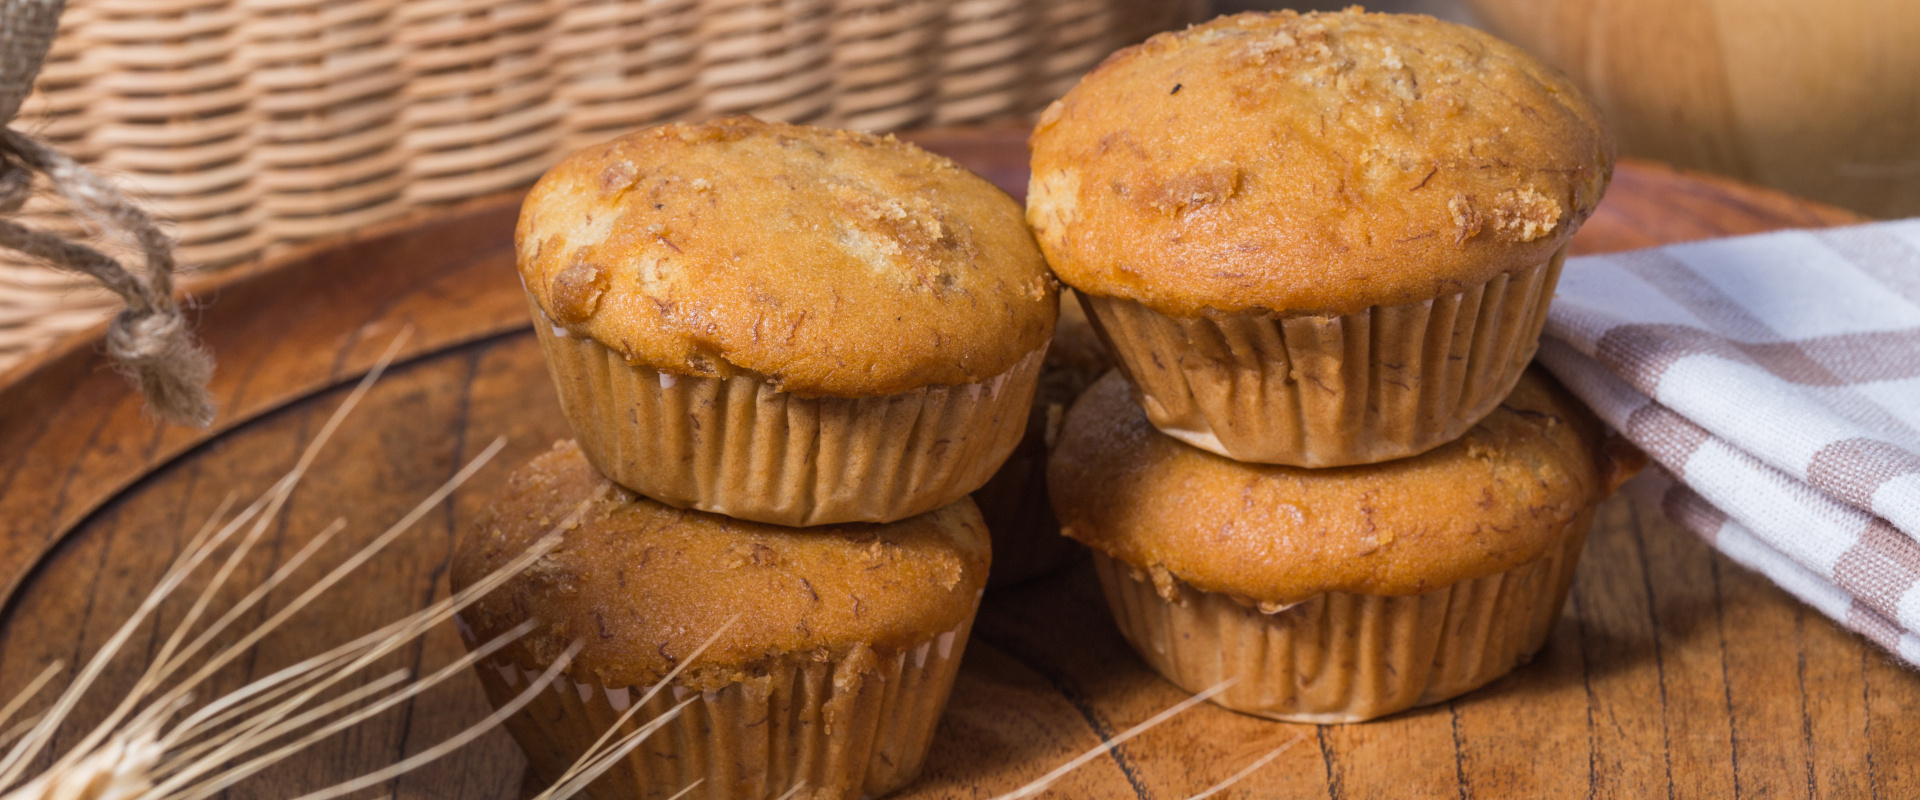 banános túrós muffin cover